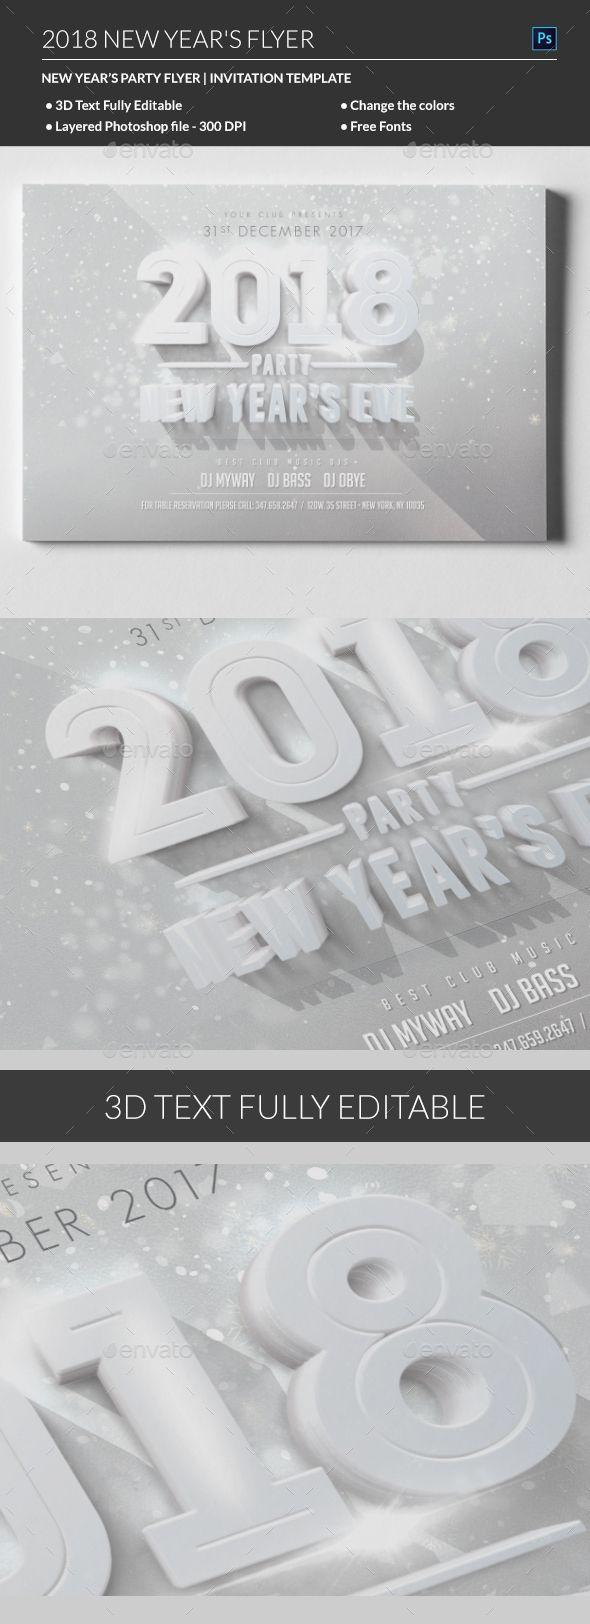 2018 New Year Flyer - #Events Flyers | Event Flyer | Pinterest ...